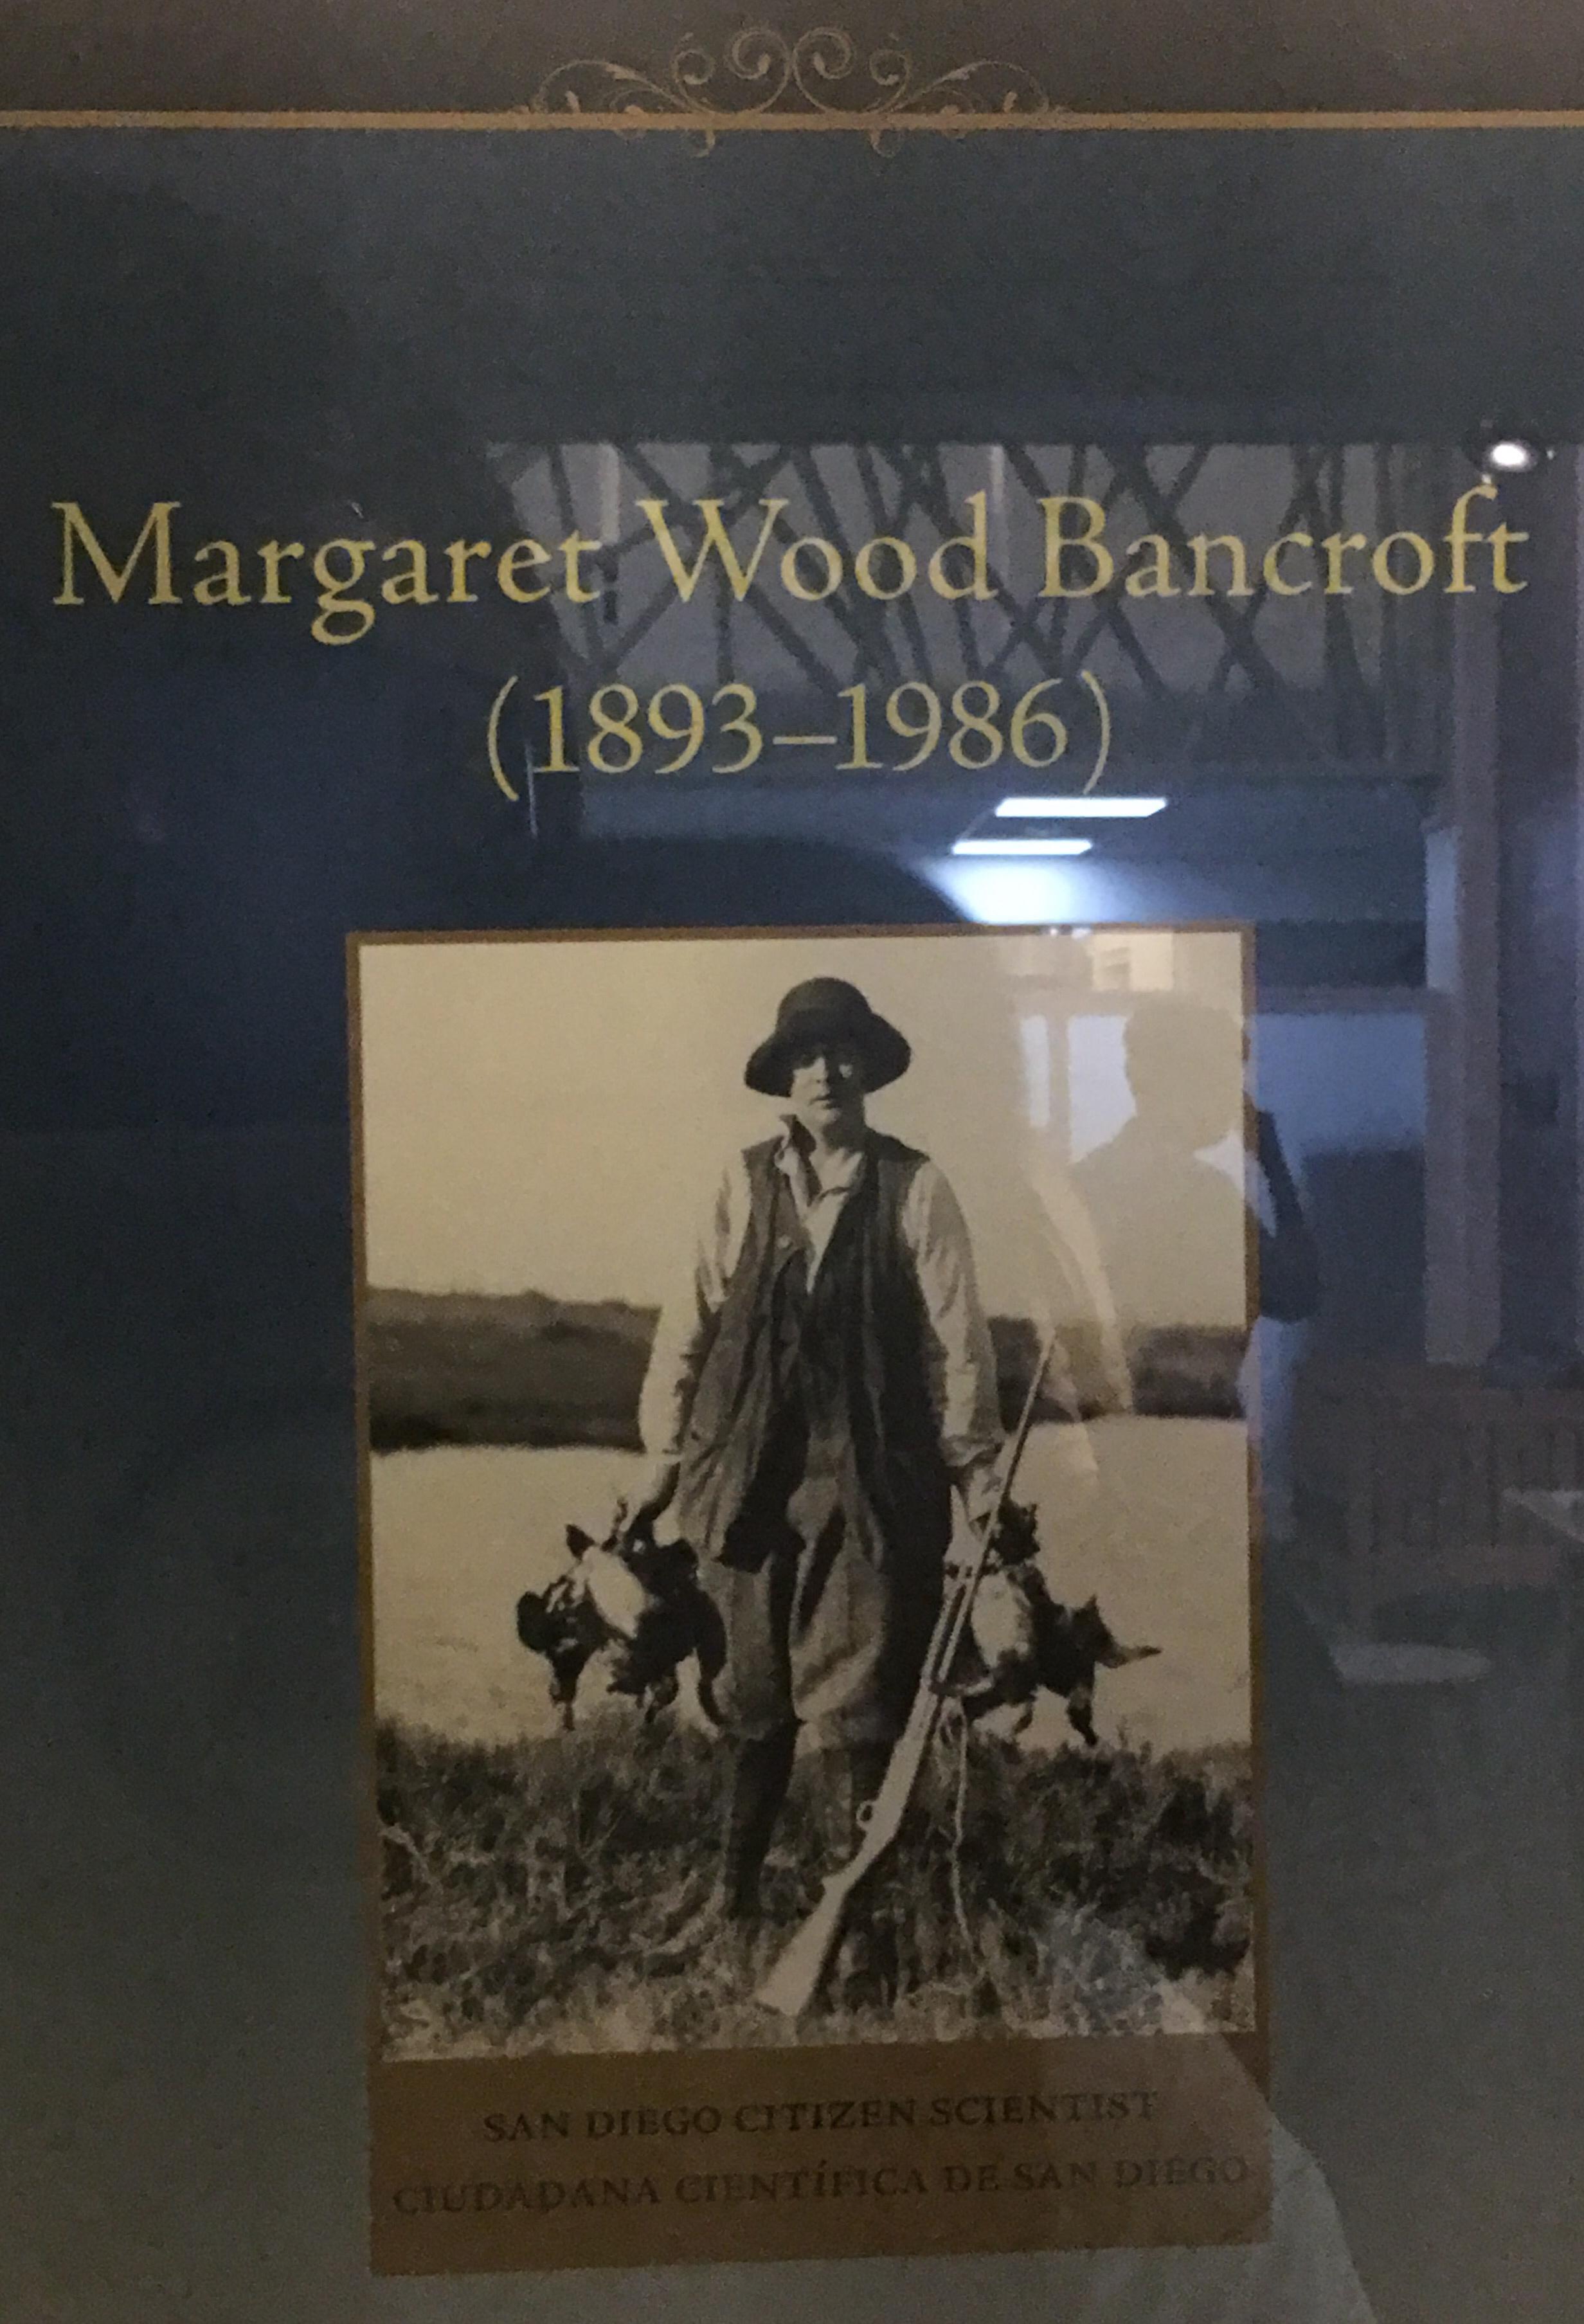 Margaret Wood Bancroft